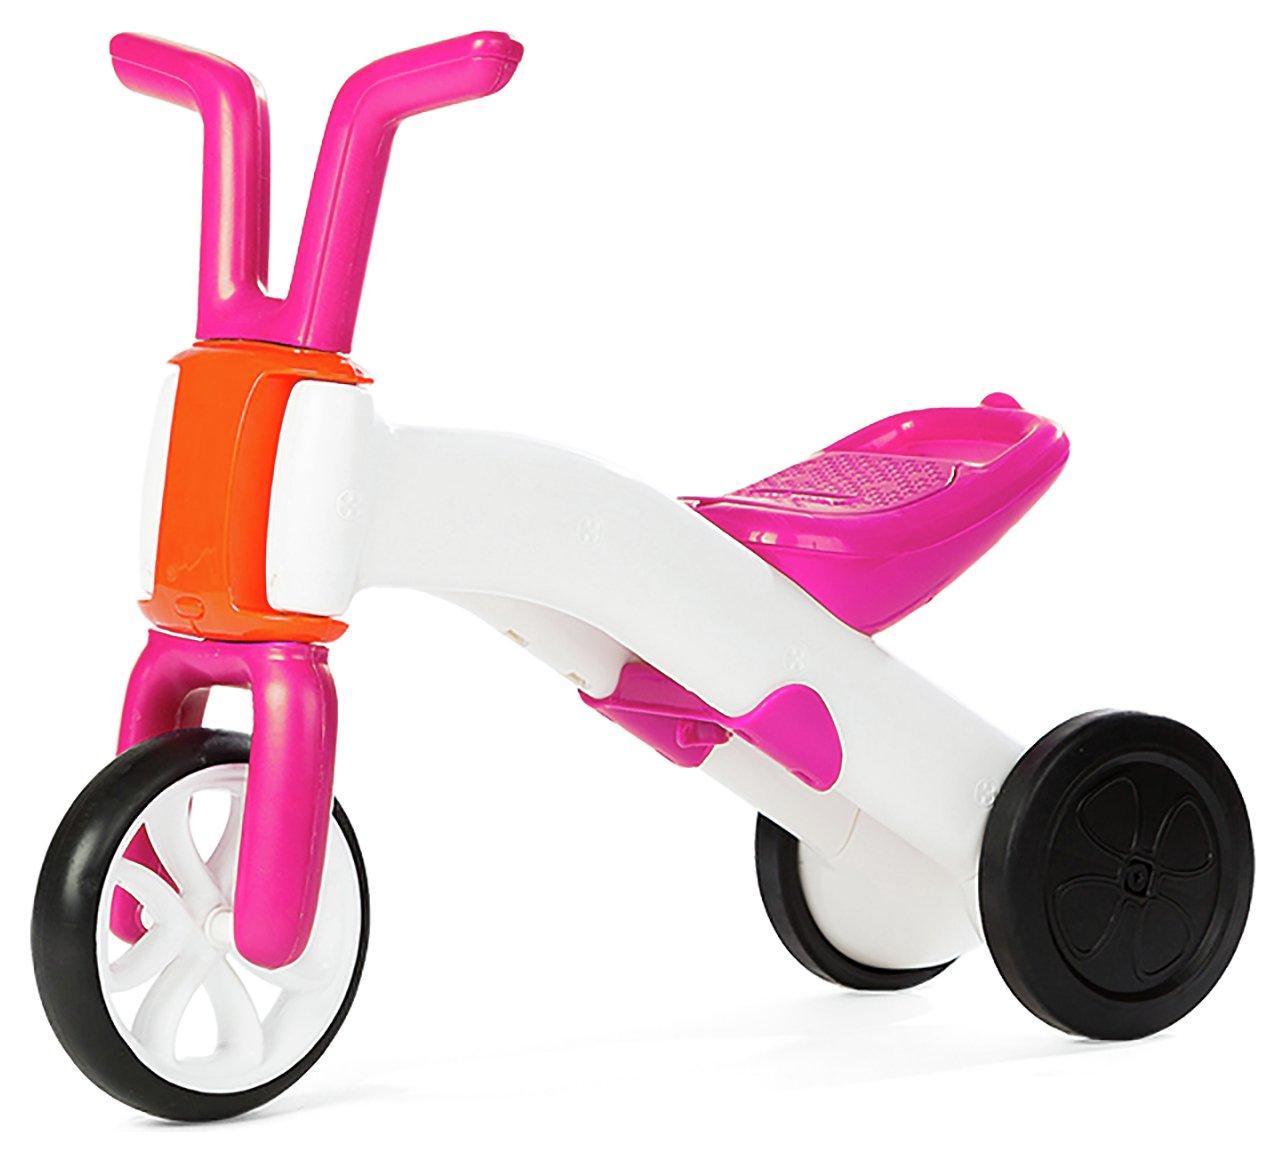 Chillafish Bunzi Pink 2 in 1 Gradual Balance Bike